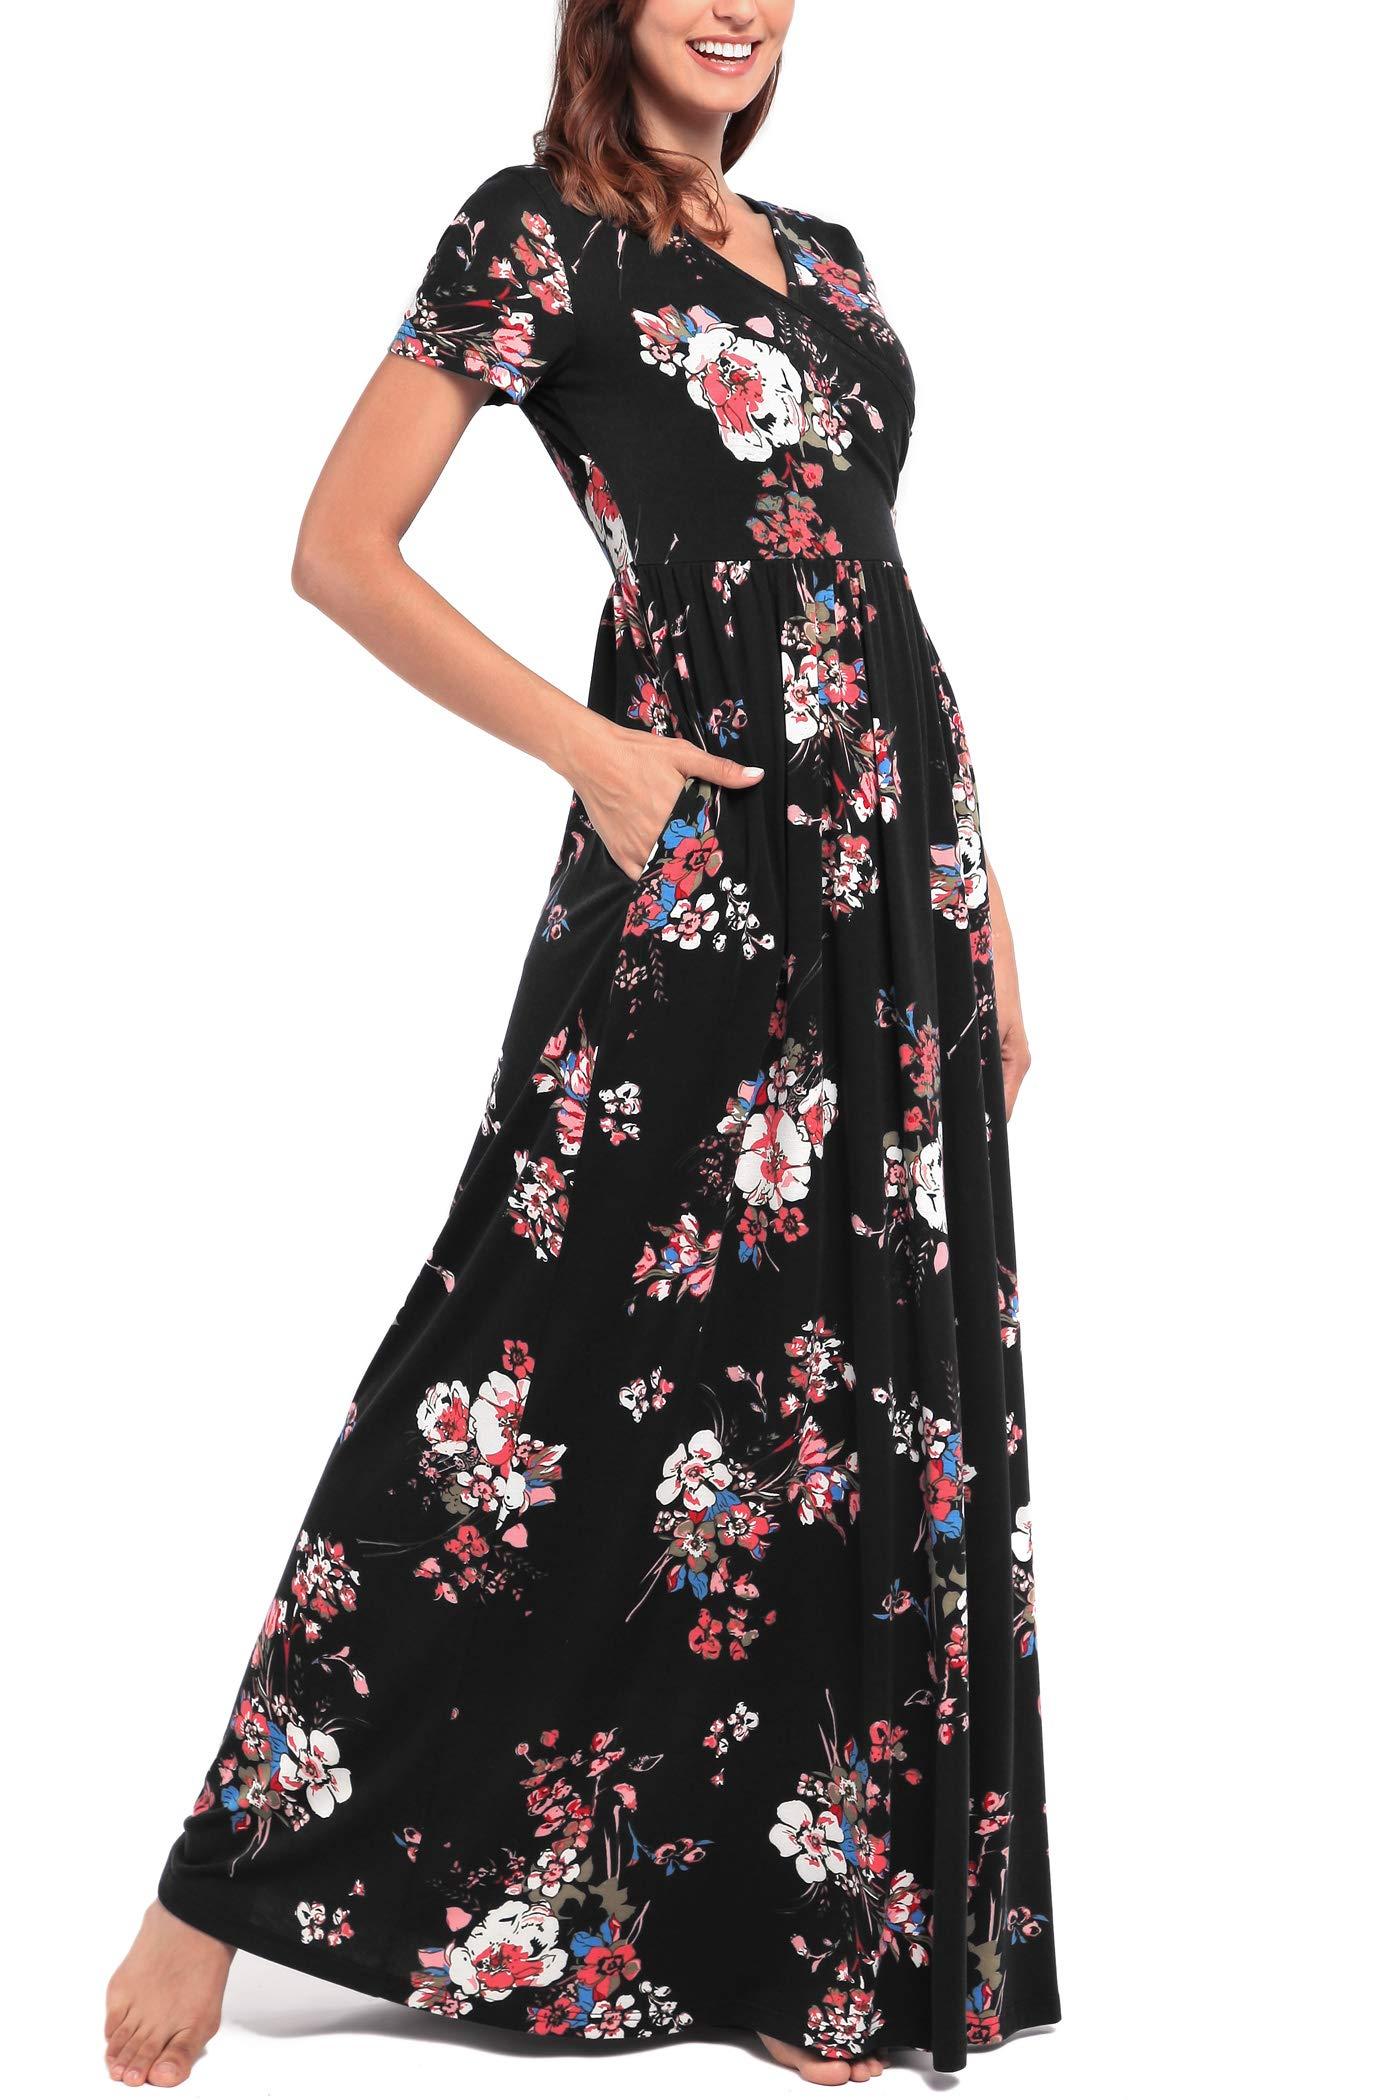 Comila Short Sleeve Maxi Dresses for Women, Summer V Neck Dress Pockets Vintage Floral Maxi Casual Dress with Pockets Elegant Work Office Long Dress Black S (US 4-6) by Comila (Image #4)